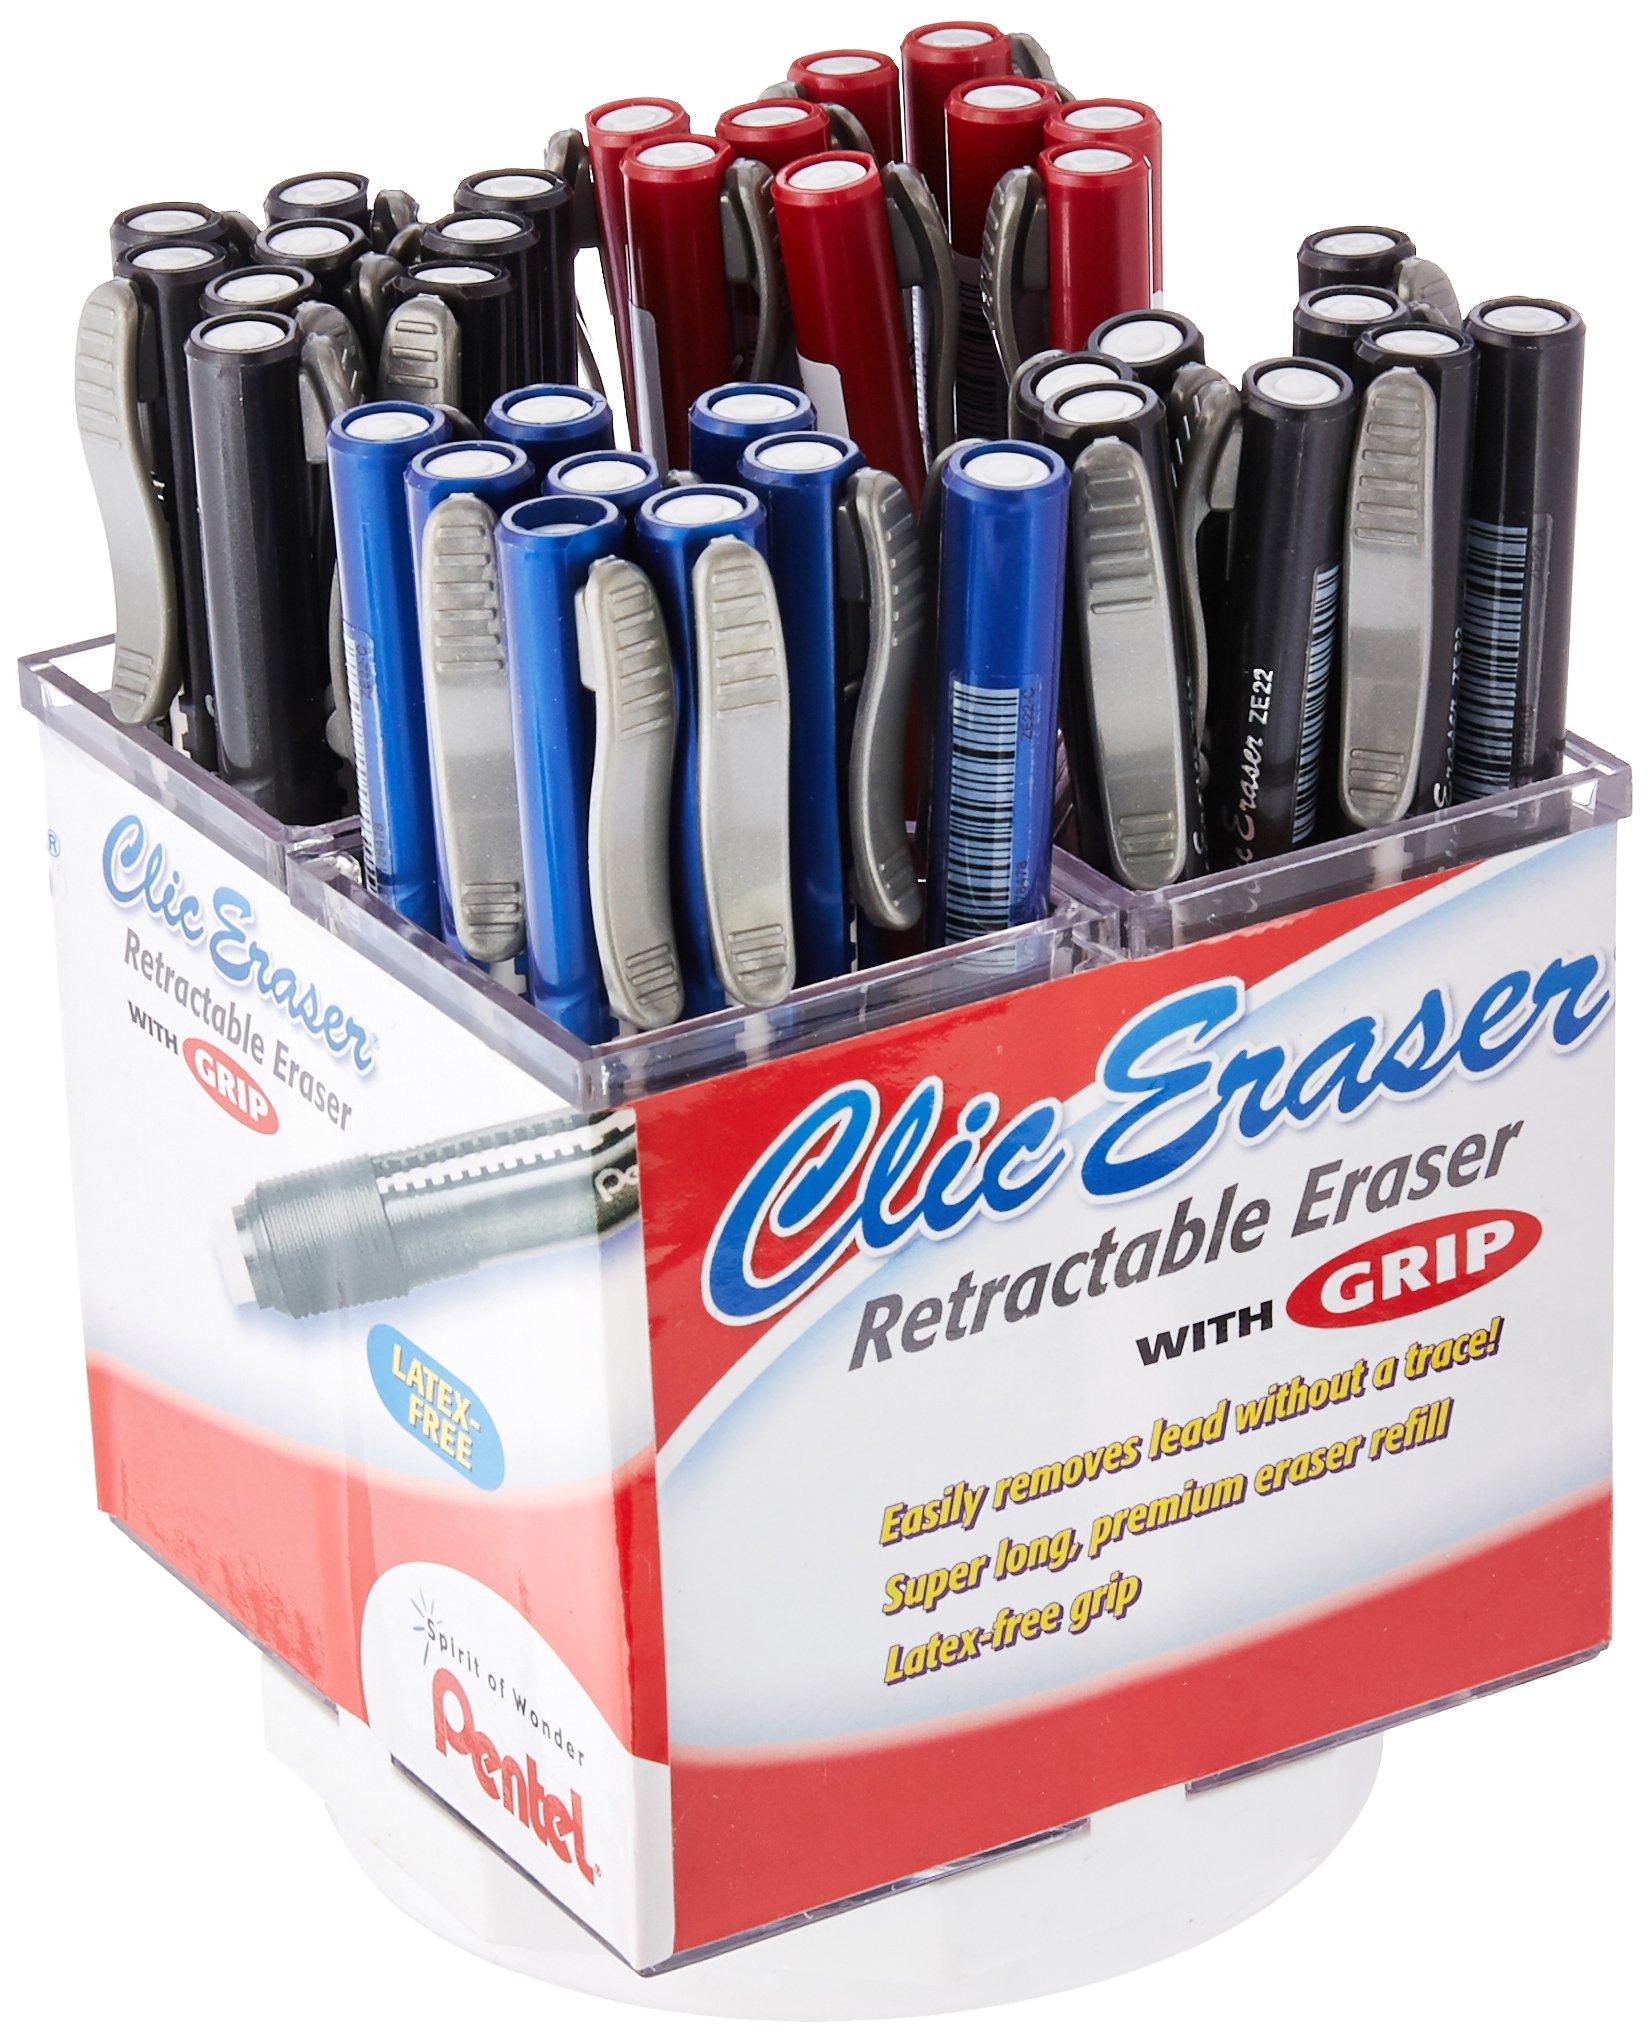 Pentel Clic Eraser Retractable Display Assortment (ZE22-5) by Pentel (Image #1)